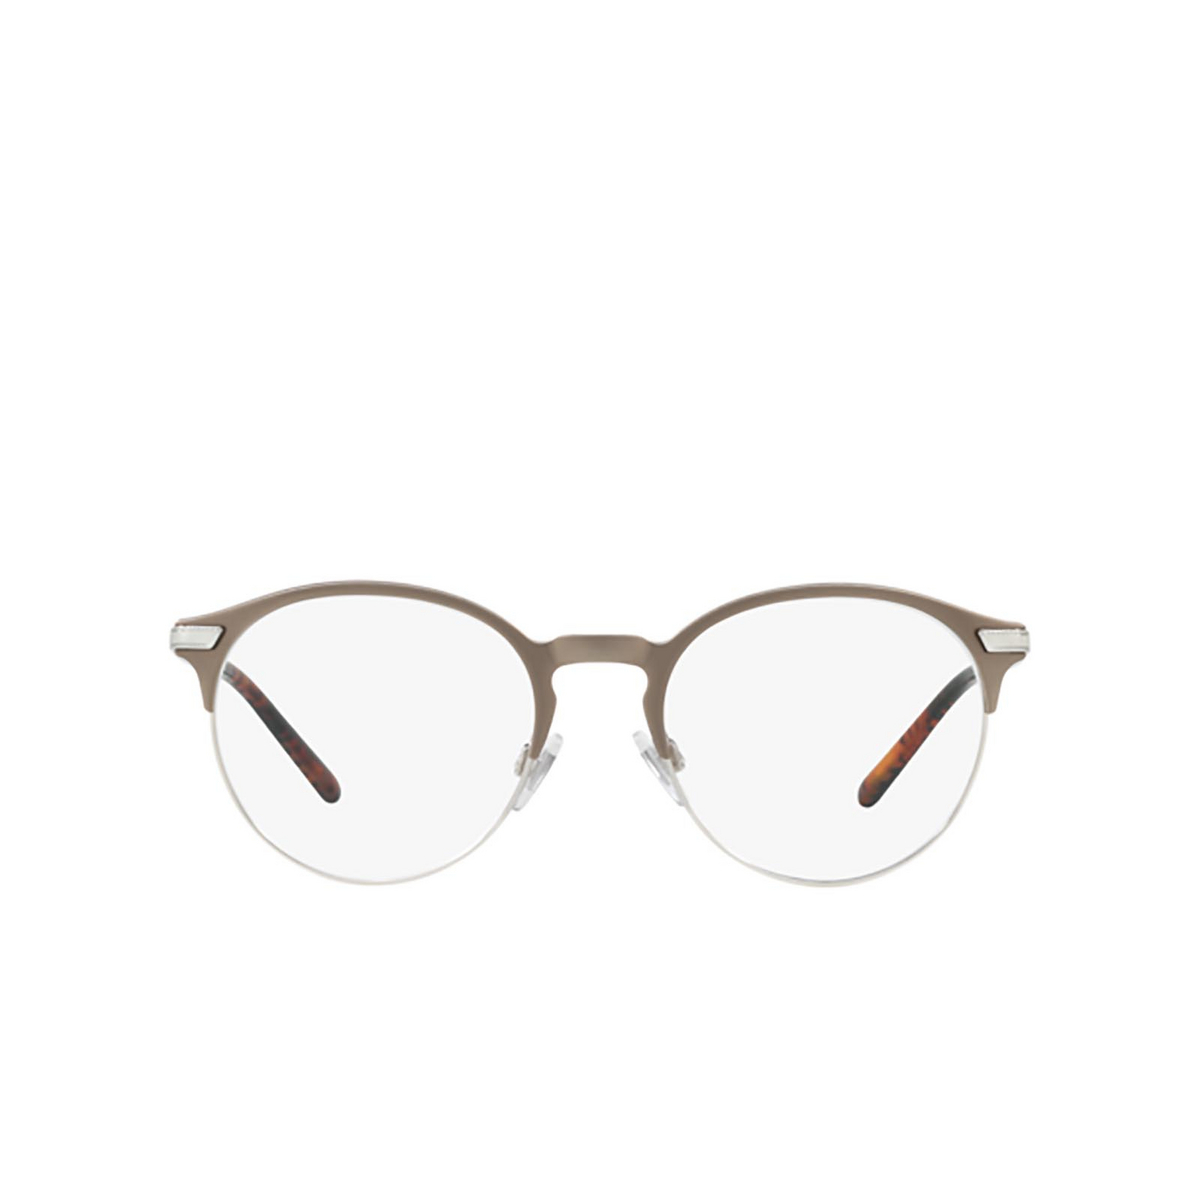 Polo Ralph Lauren® Round Eyeglasses: PH1170 color 9328.